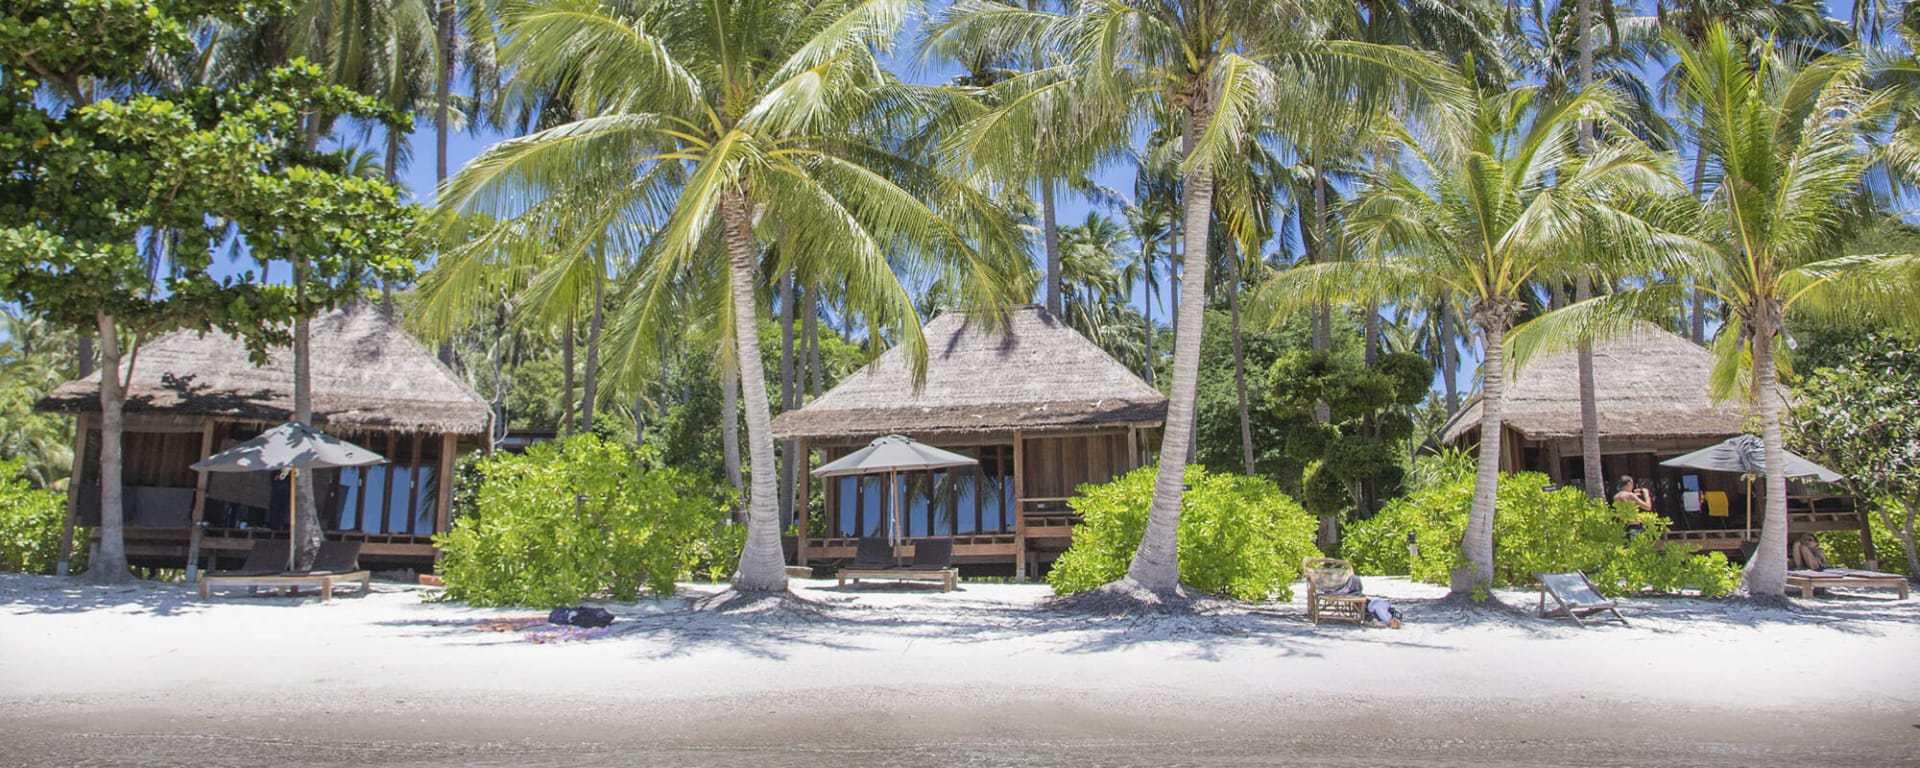 The Haad Tien Beach Resort in Ko Tao: Thailand The Haadtien Beach Resort Beach Villa